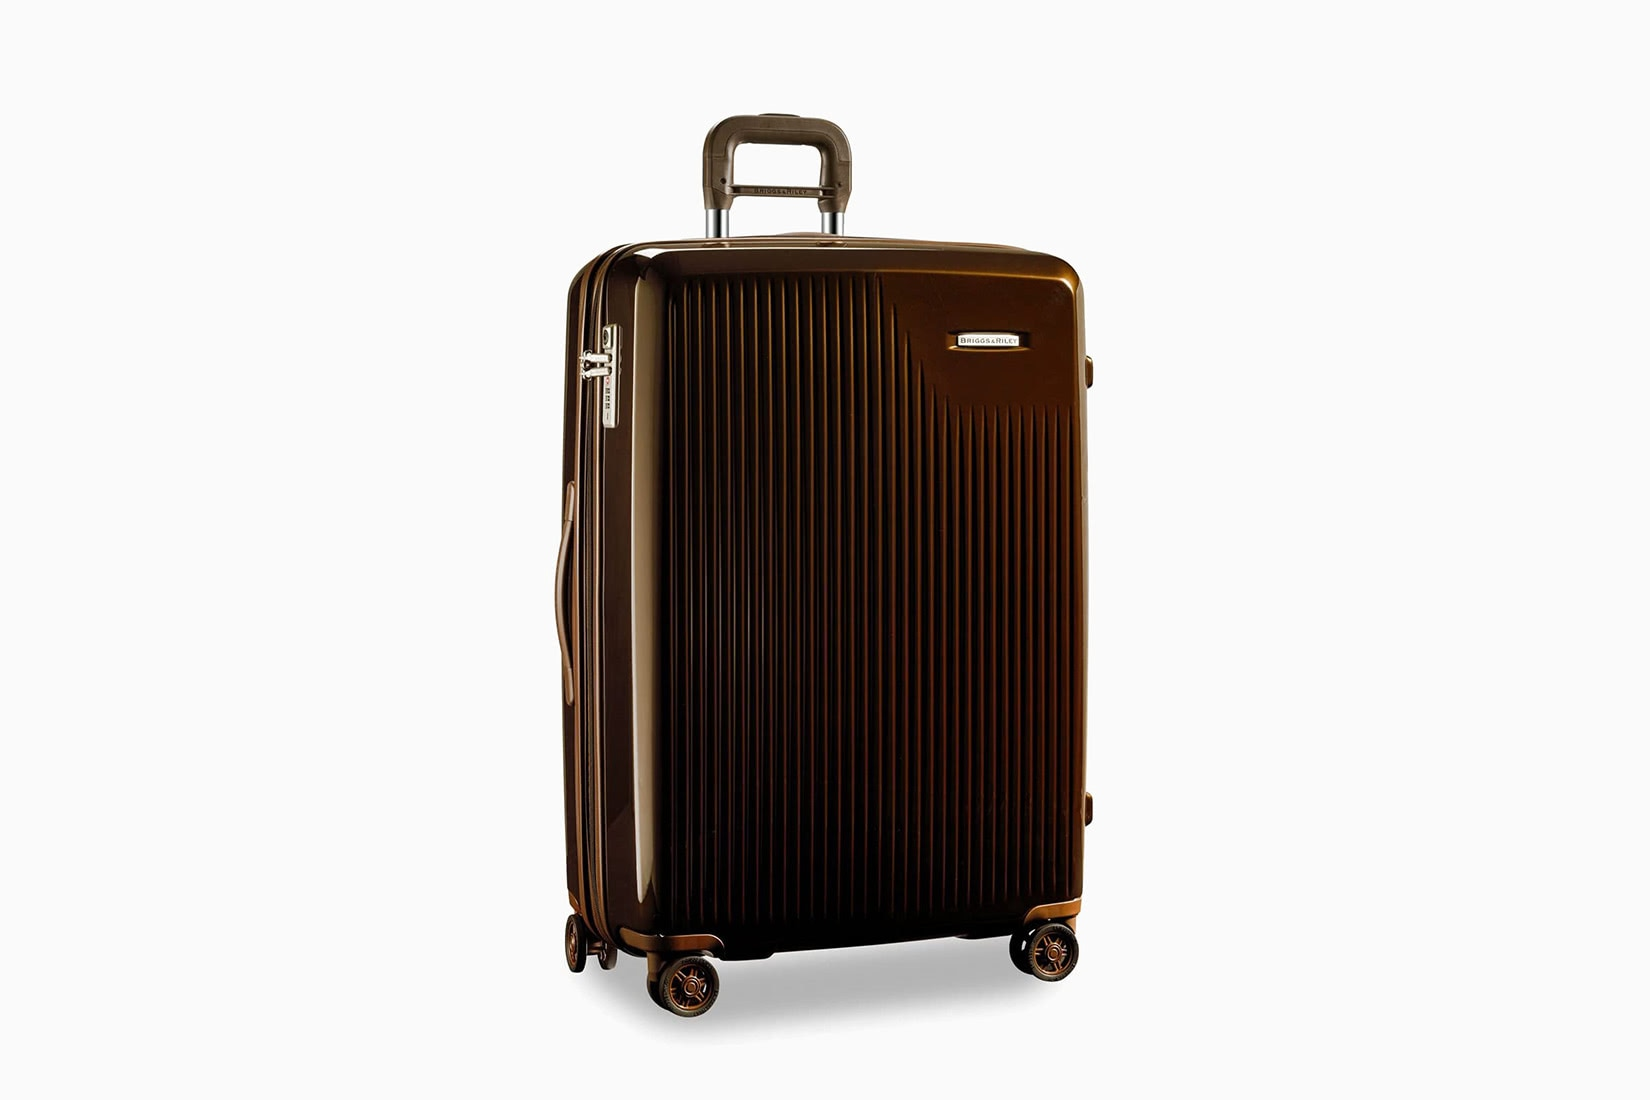 best luggage brands high-end suitcase premium briggs riley sympatico - Luxe Digital